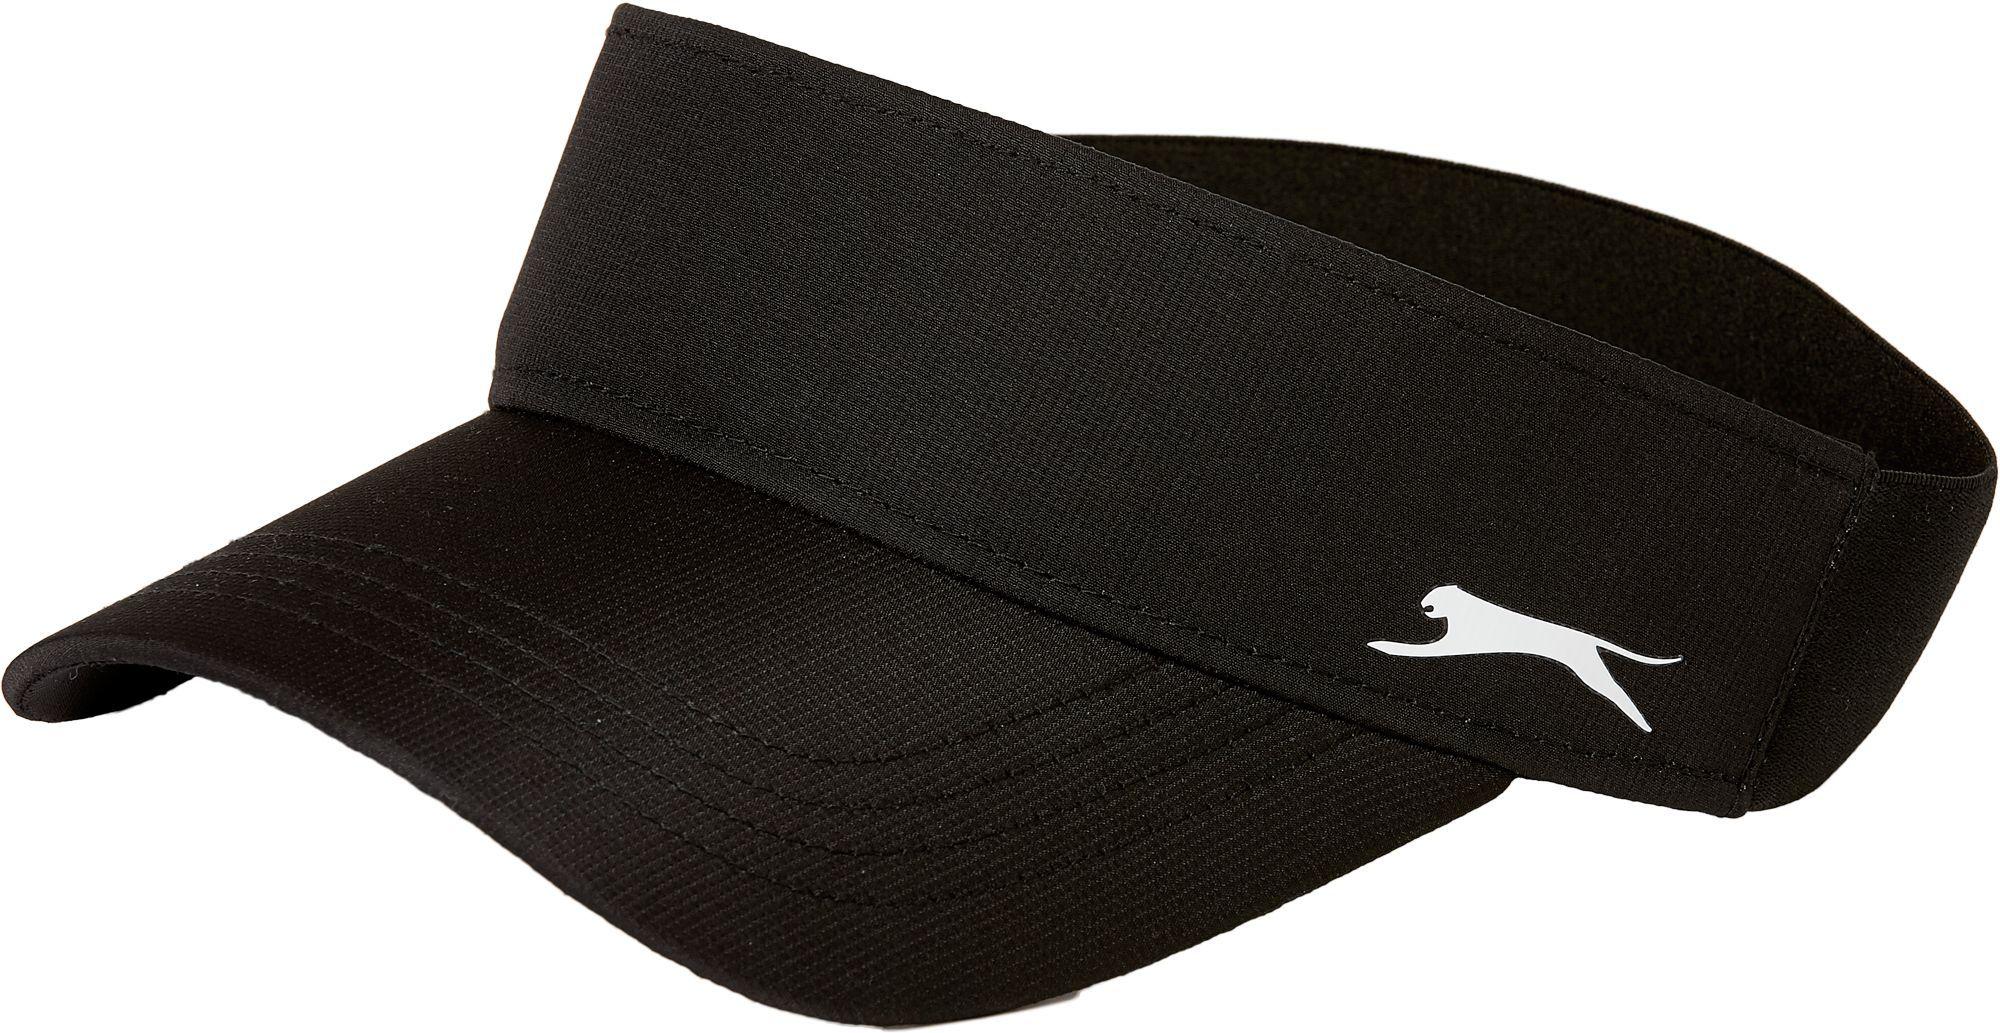 8c1b4fc24 Slazenger Women's Tech Elastic Golf Visor | Products | Golf outfit ...